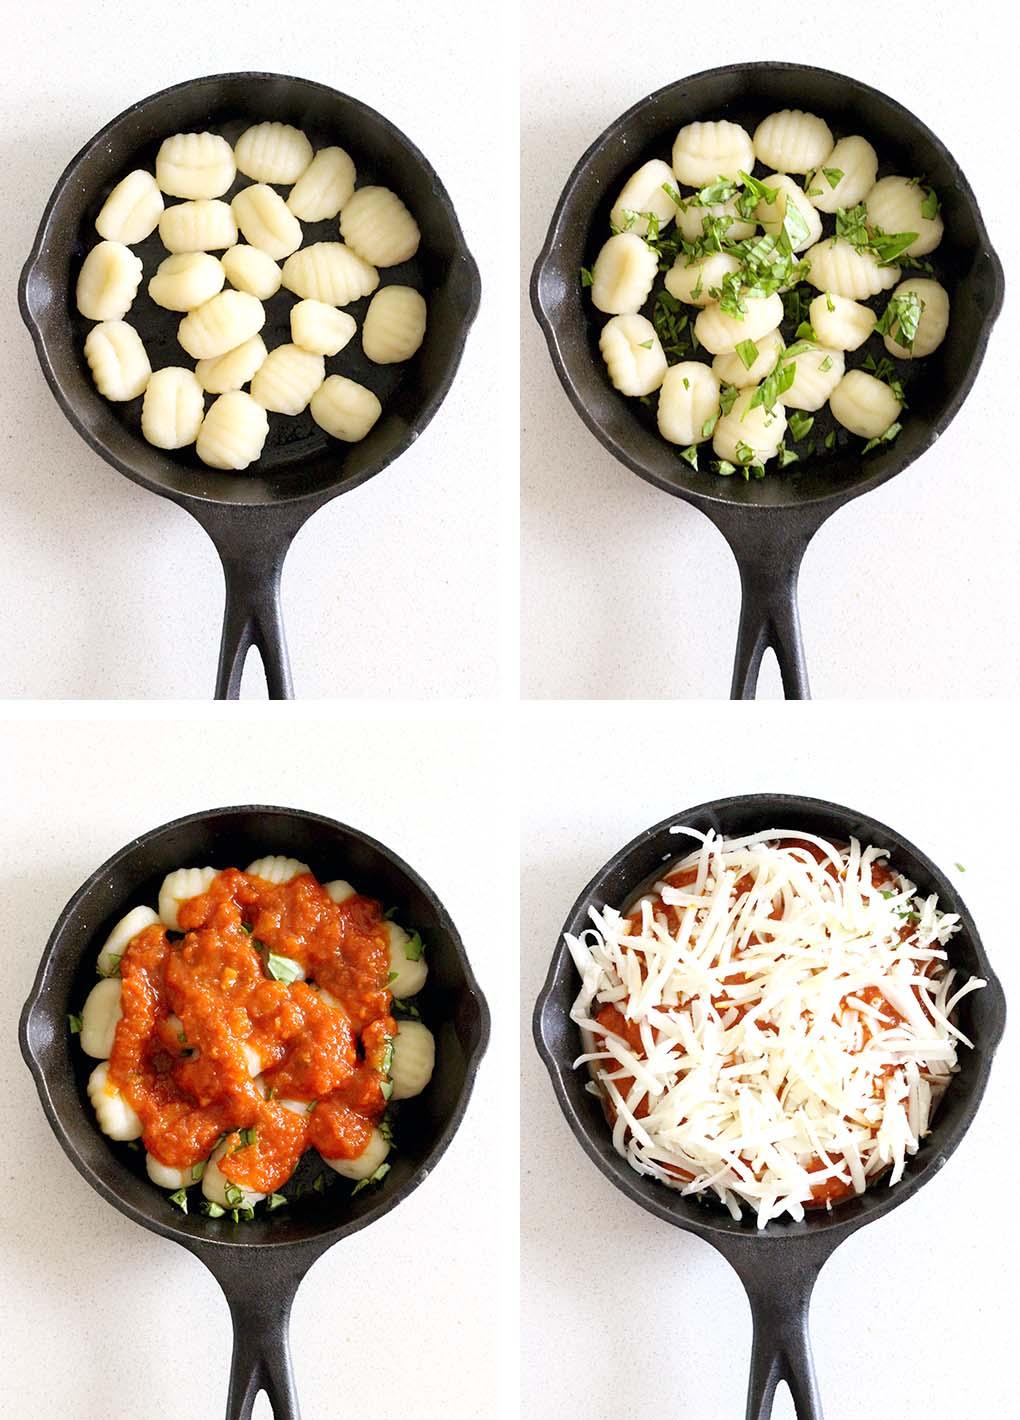 four ingredient gnocchi with marinara sauce and fresh basil